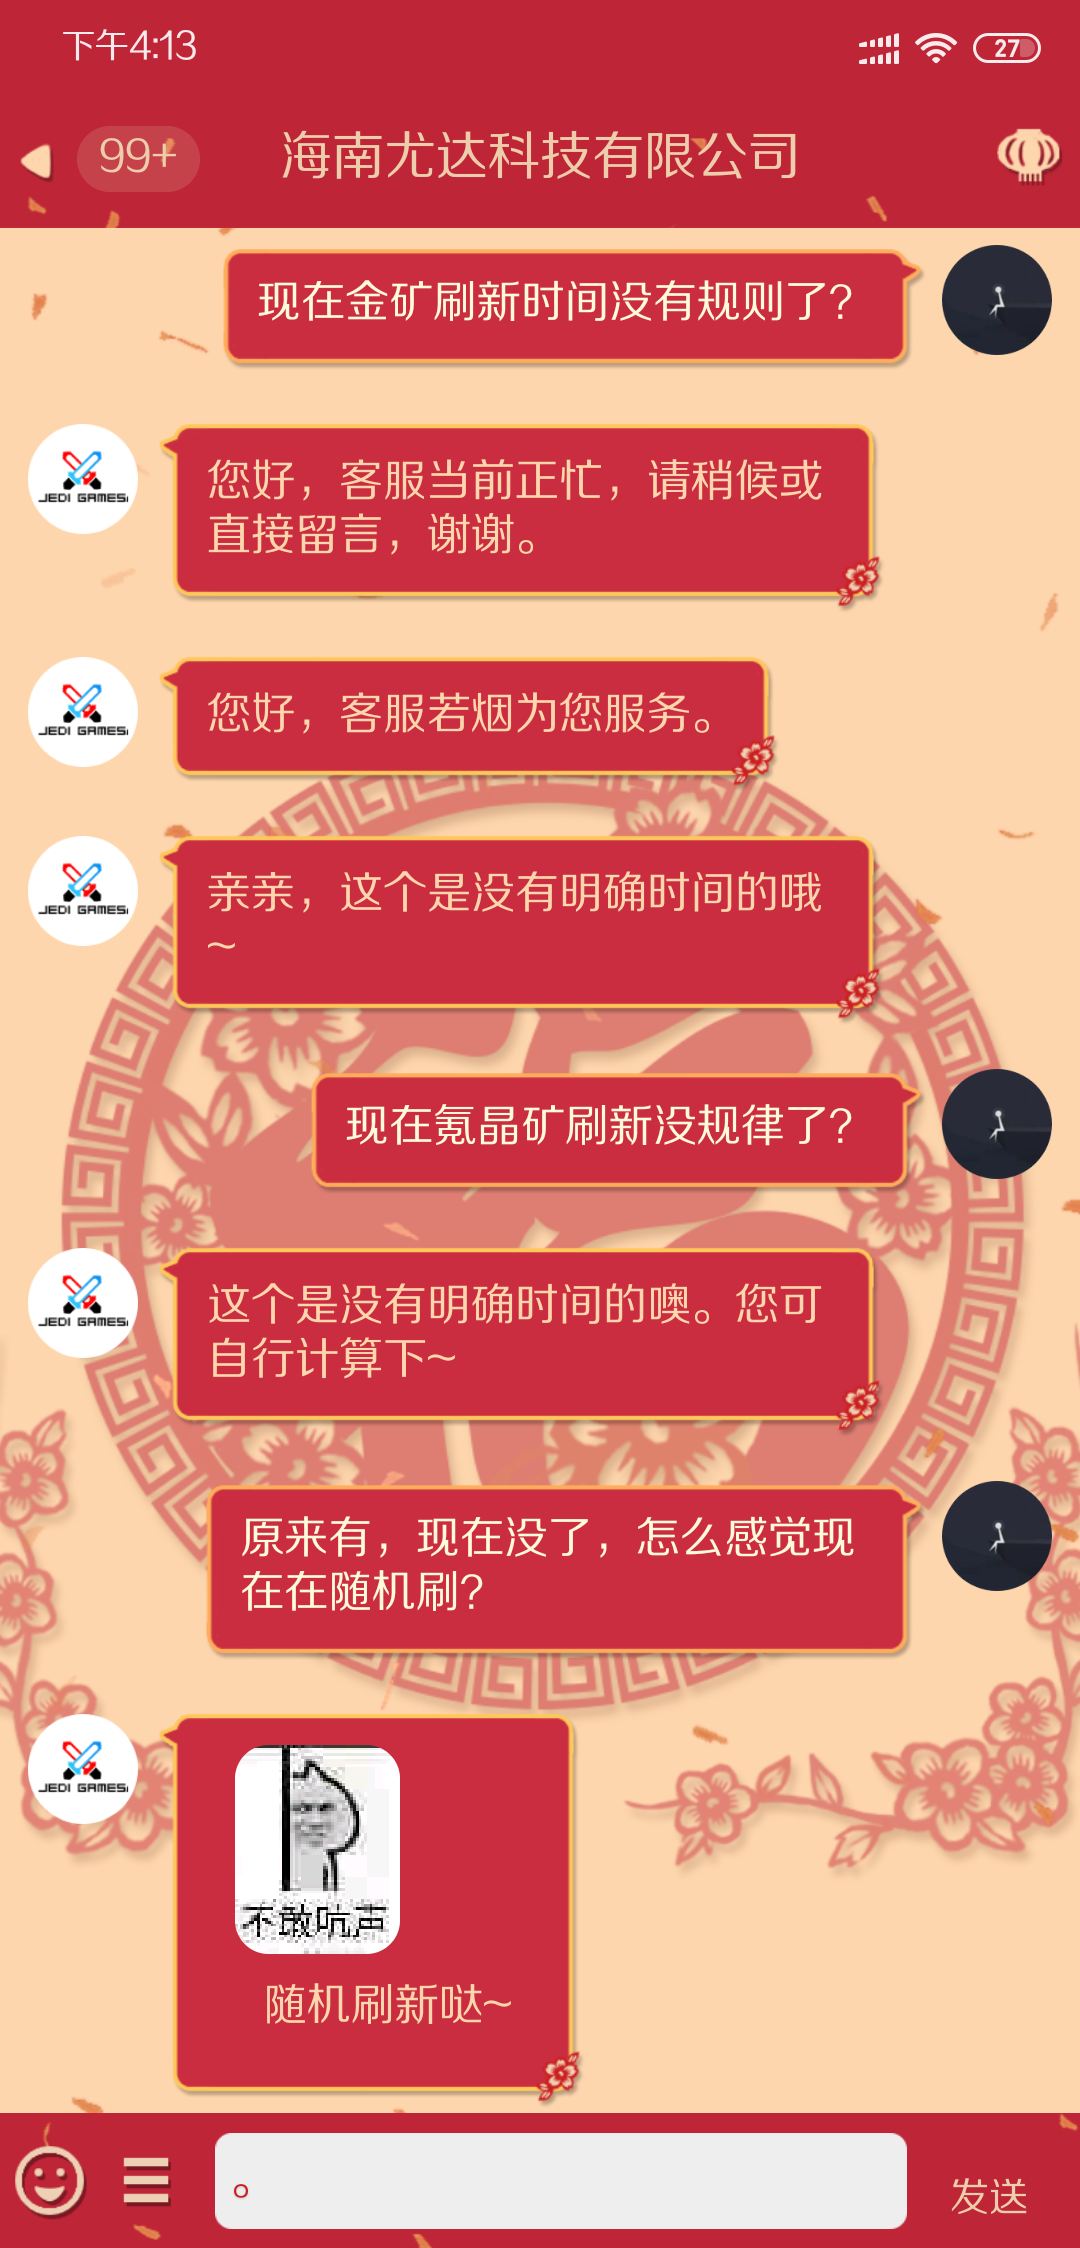 Screenshot_2019-03-31-16-13-17-694_com.tencent.mobileqq.png